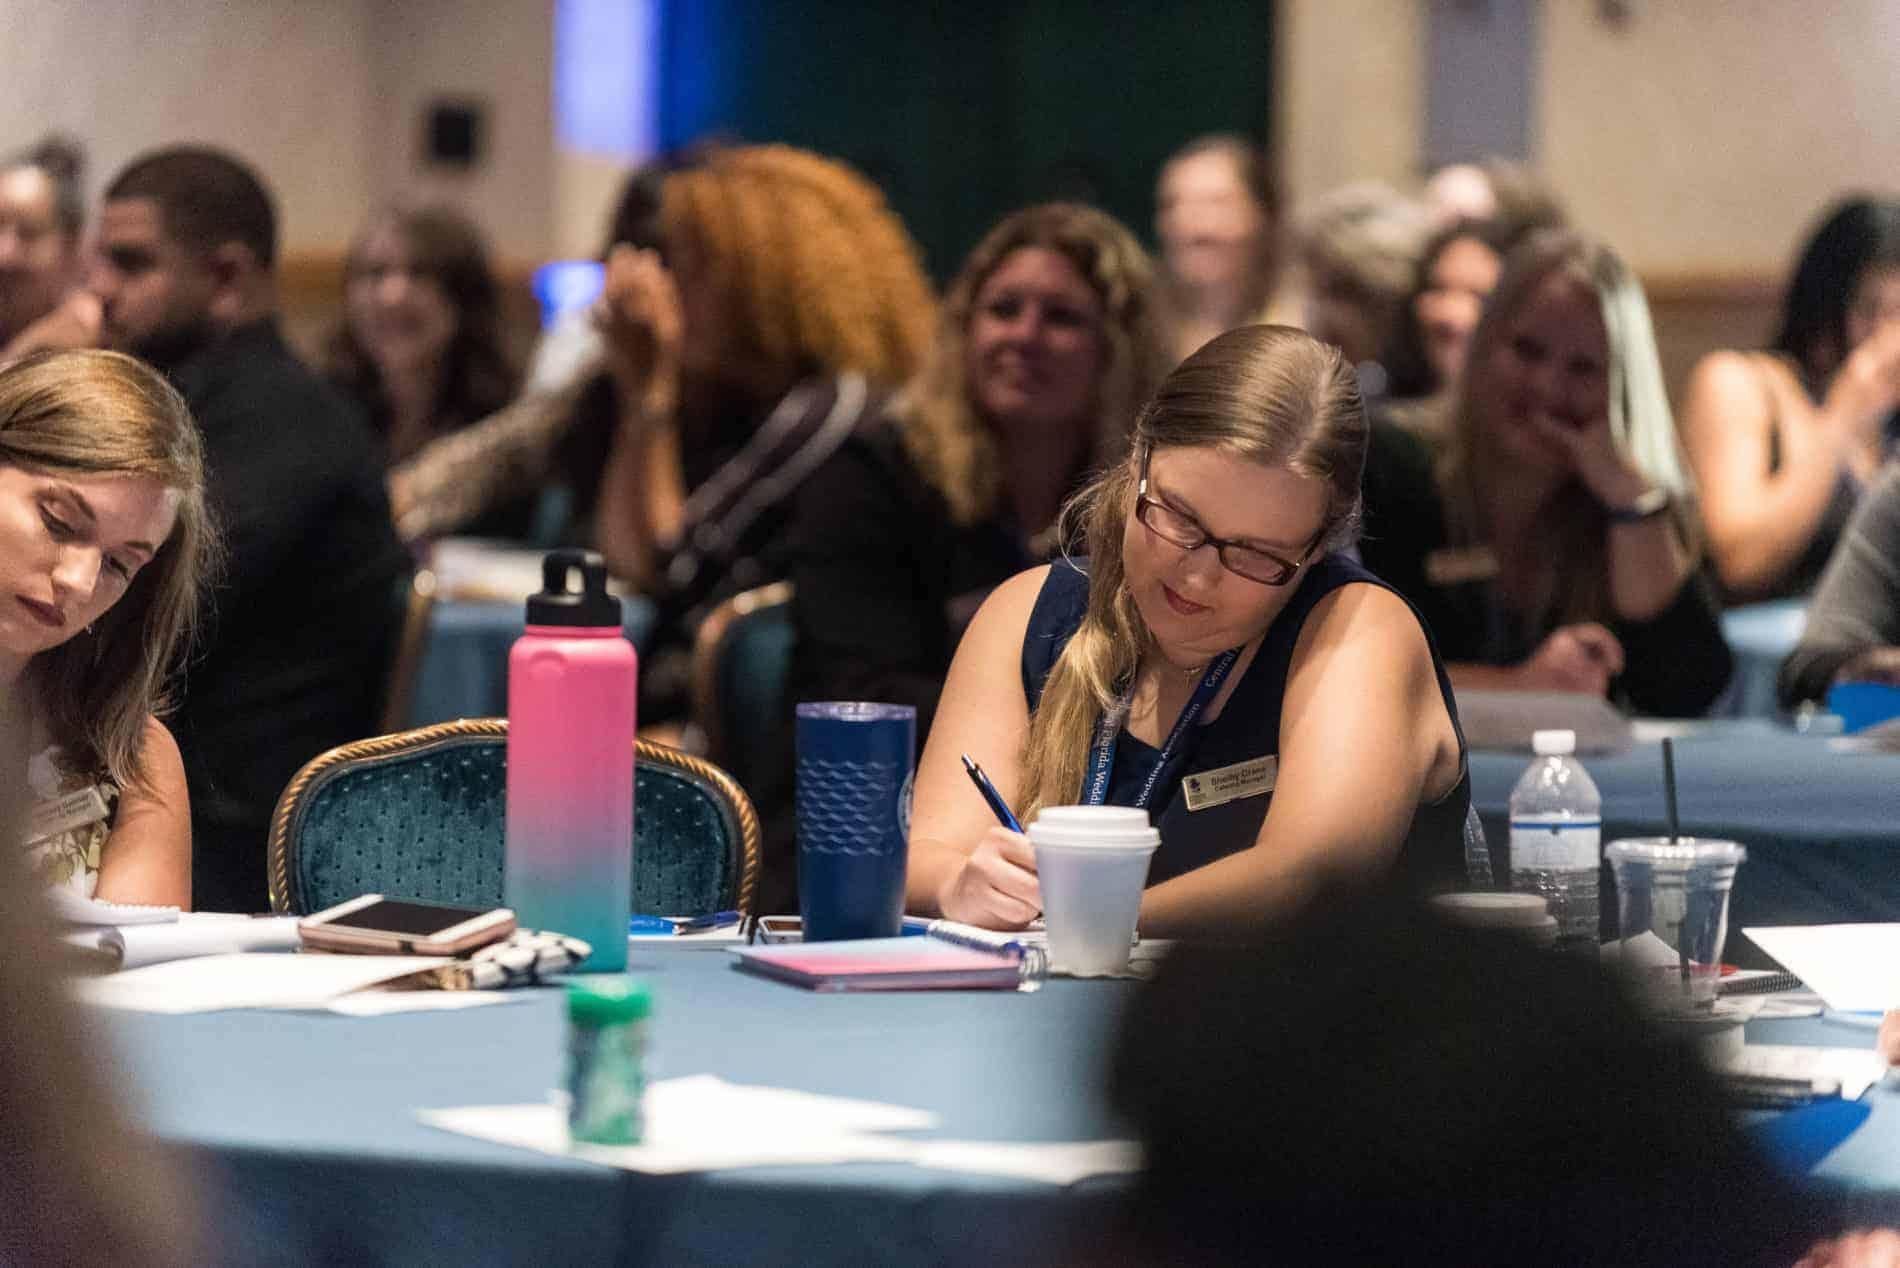 CFWA The Summit Amazing Wedding Education Conference